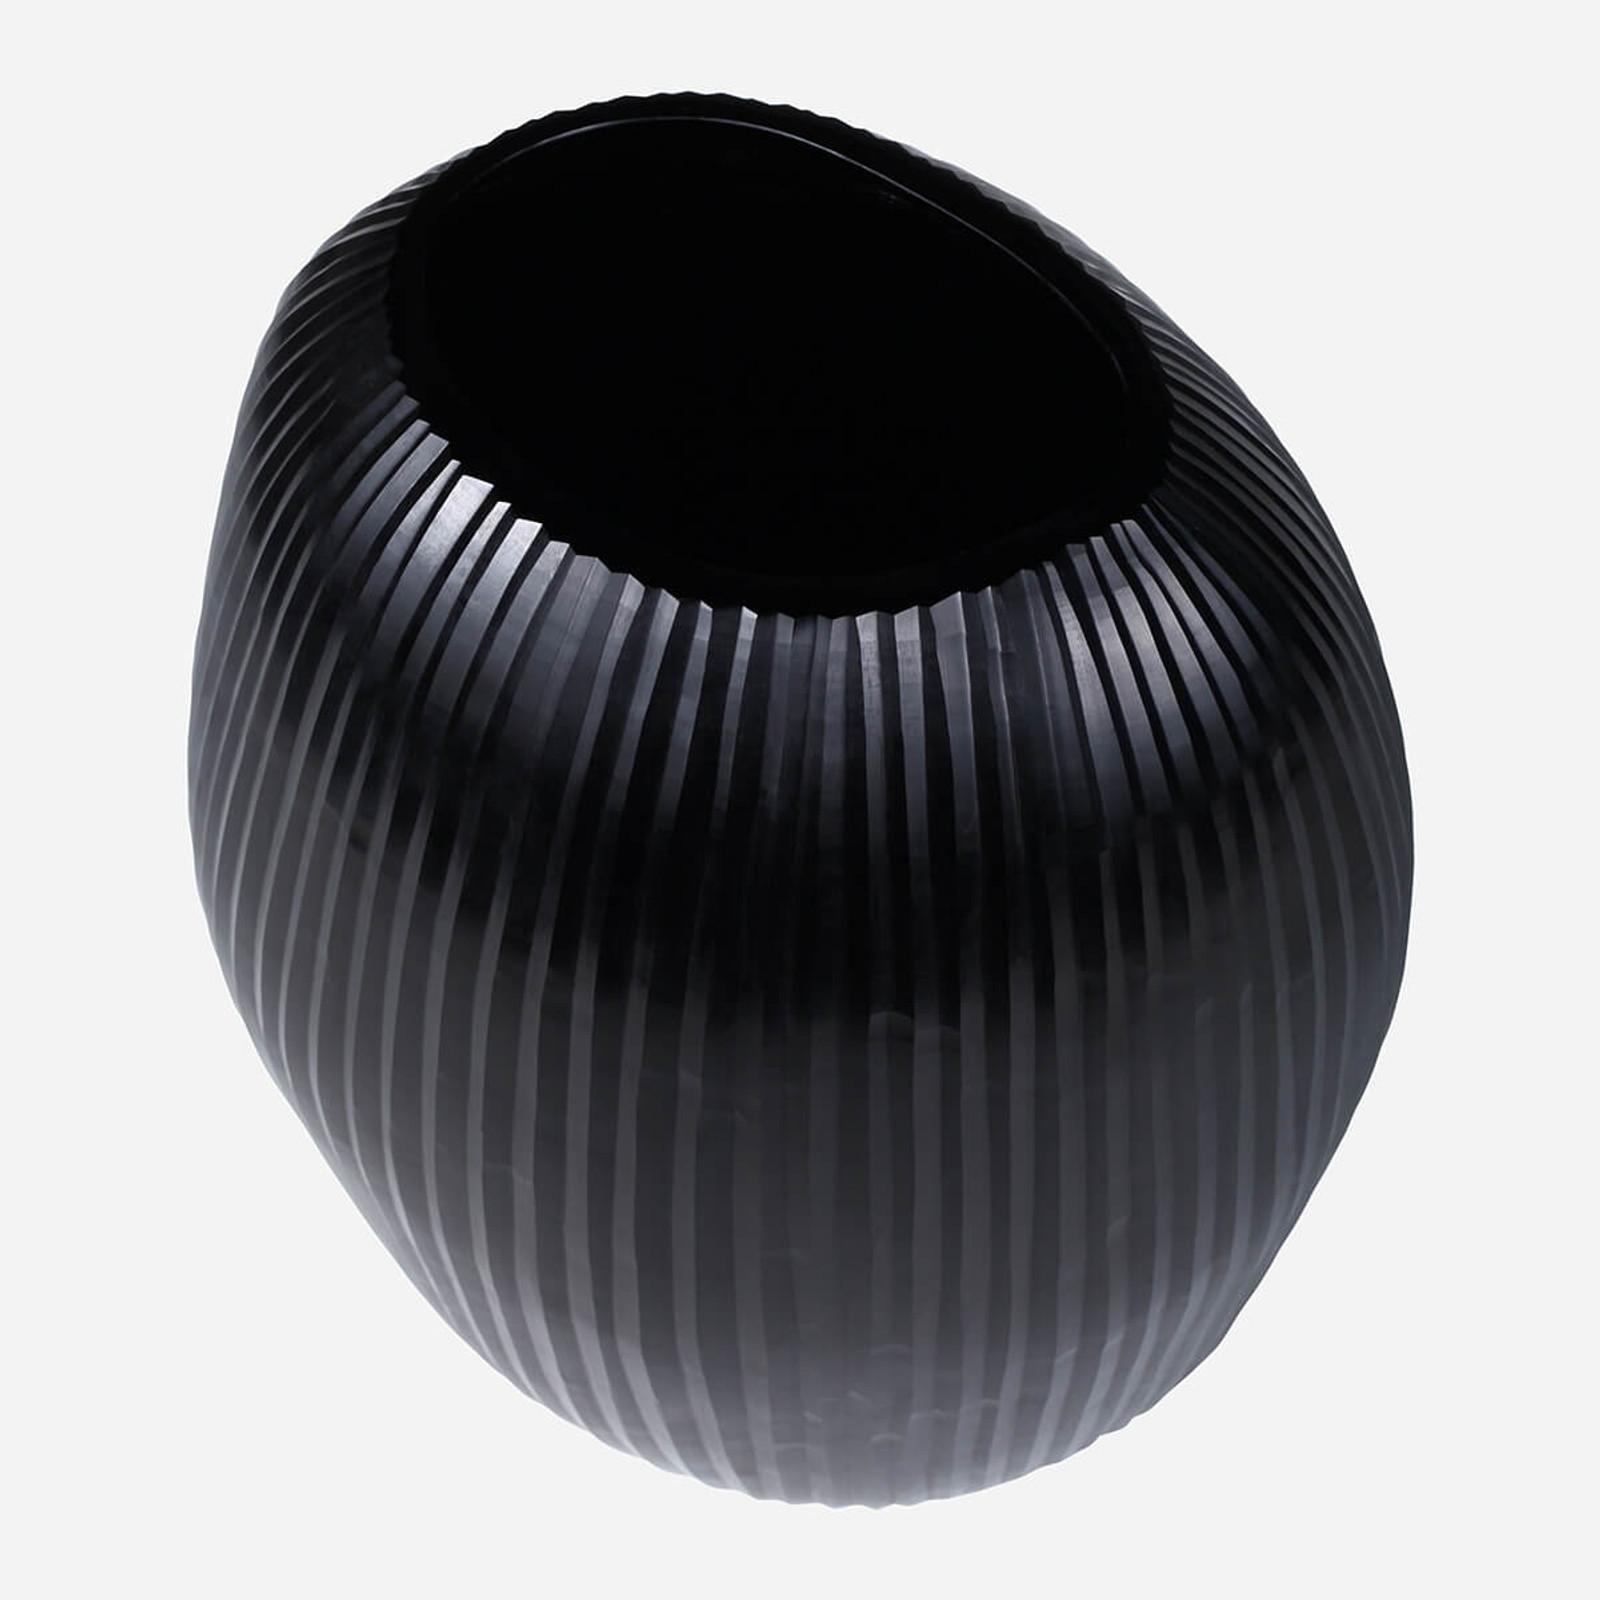 Seine Large Vase, Black